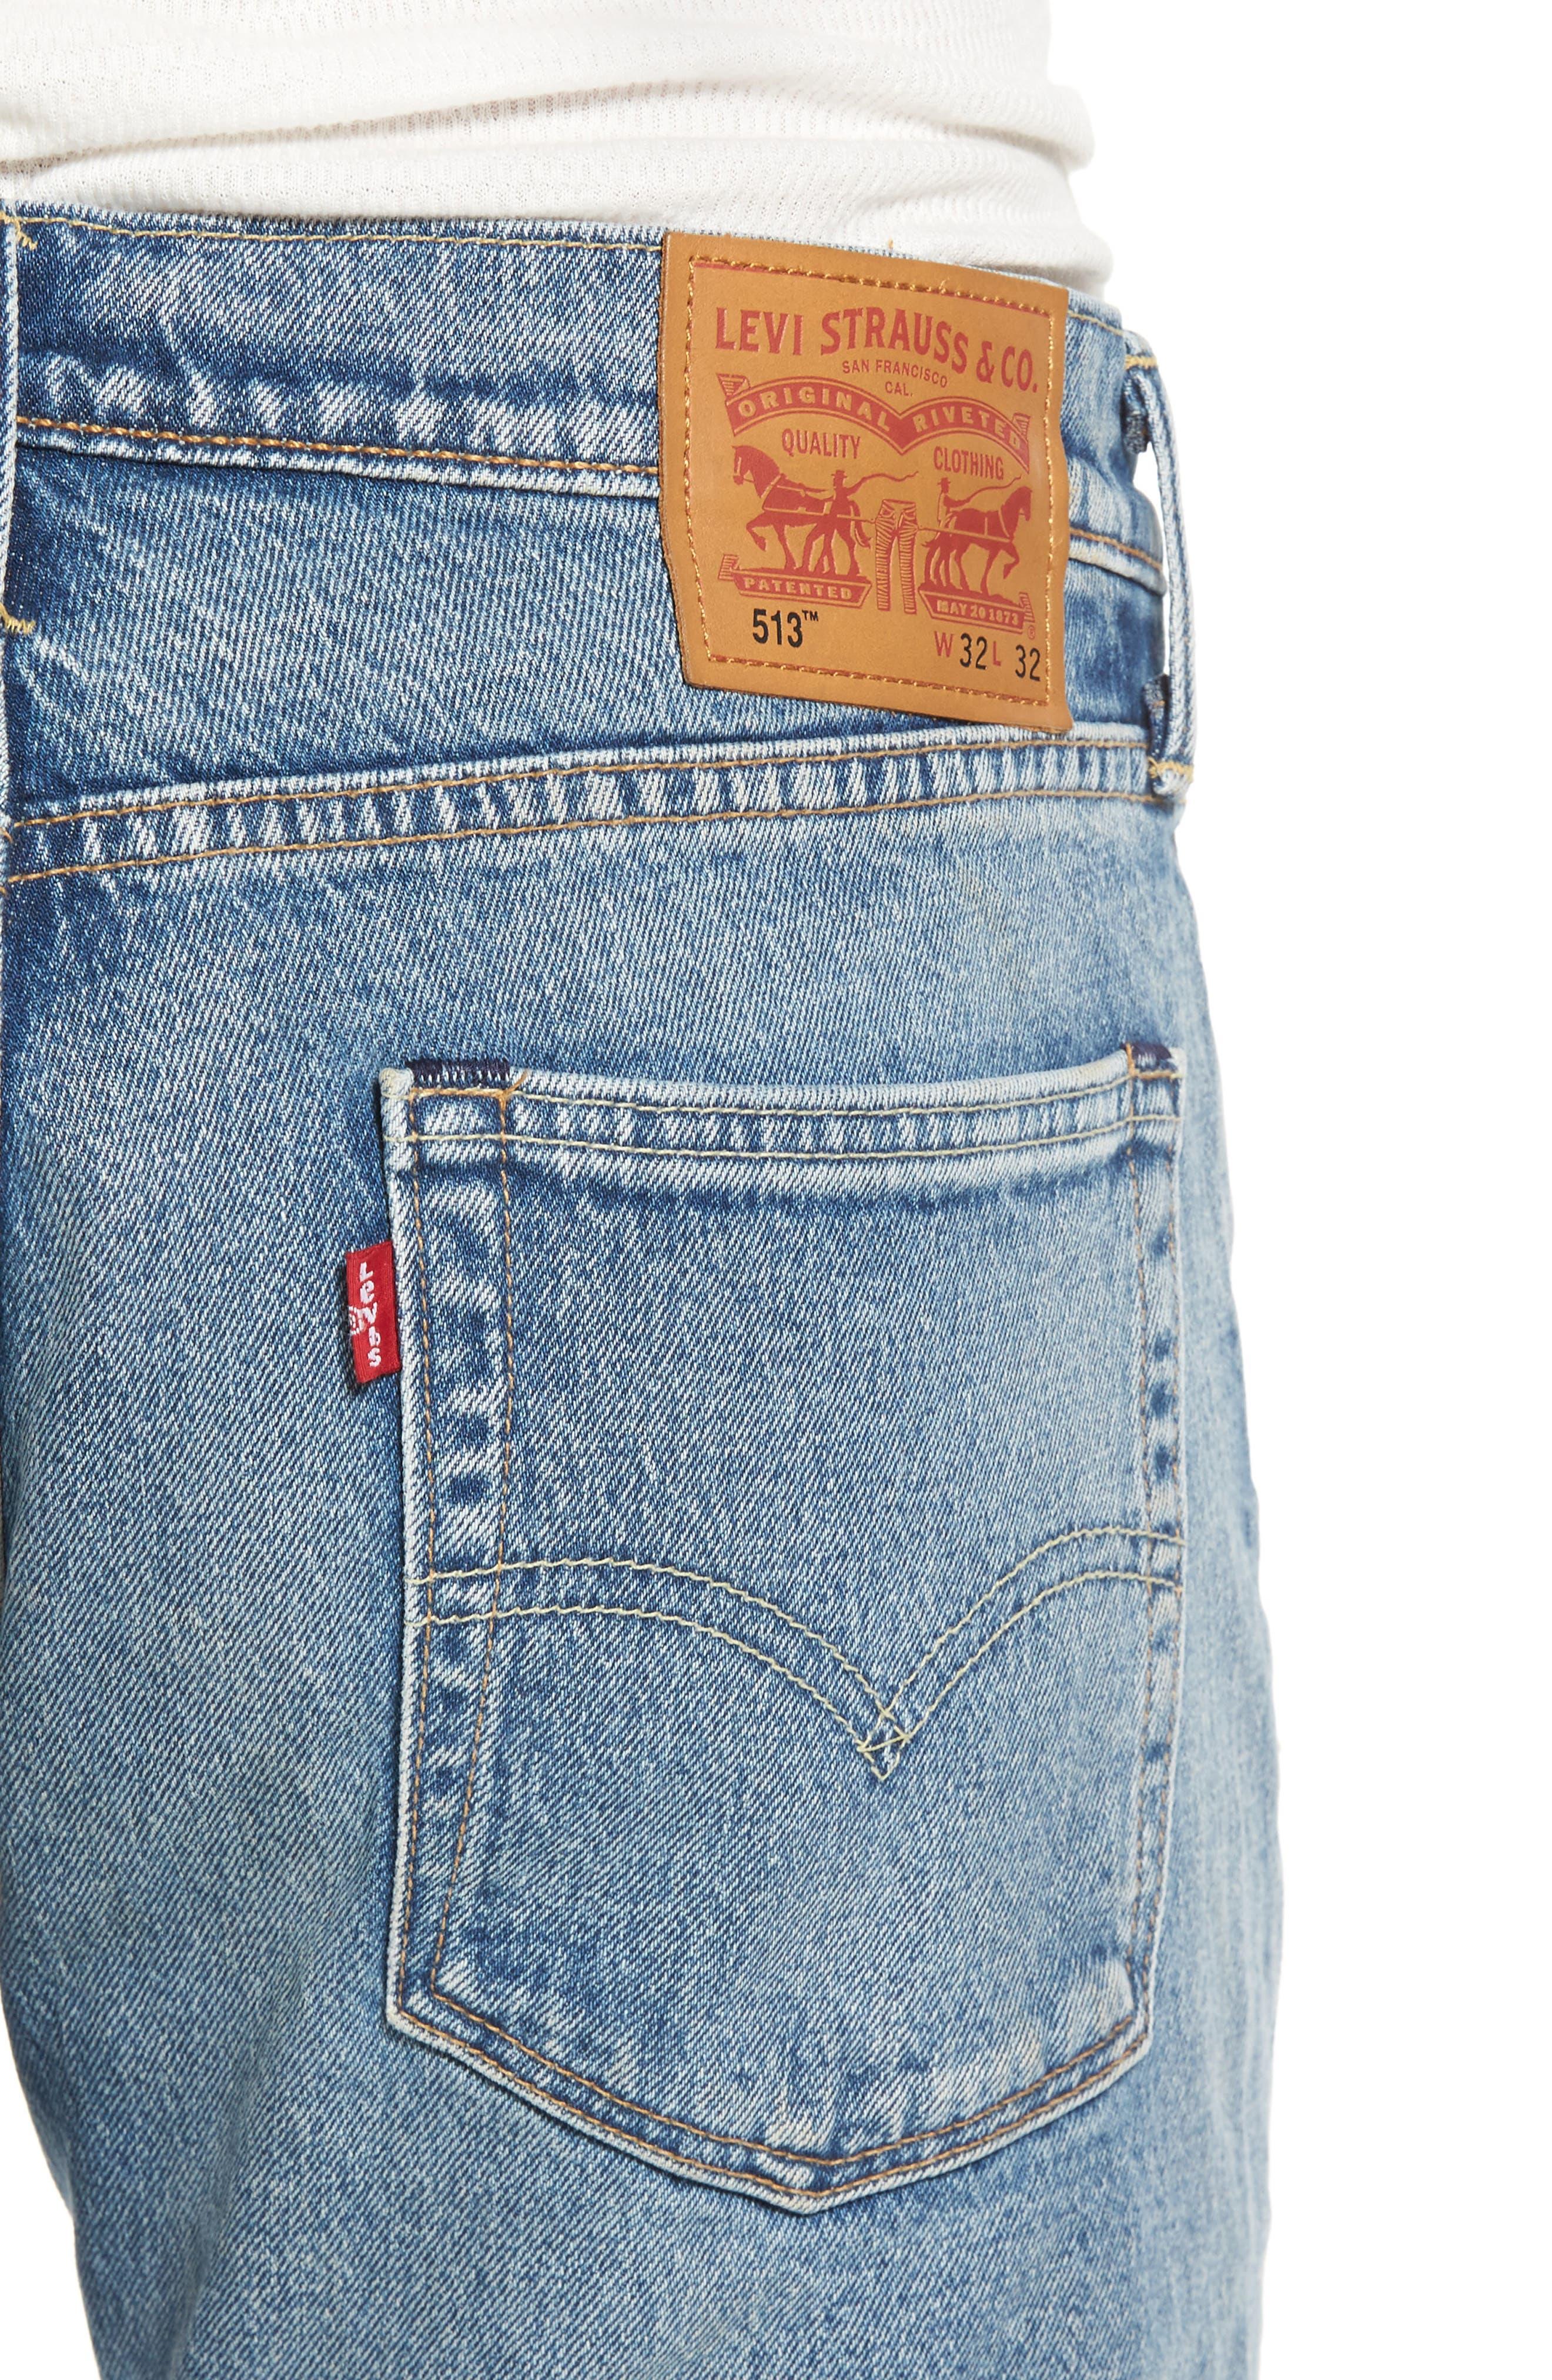 Alternate Image 4  - Levi's® 513™ Slim Straight Leg Jeans (Light Blue Rolf)